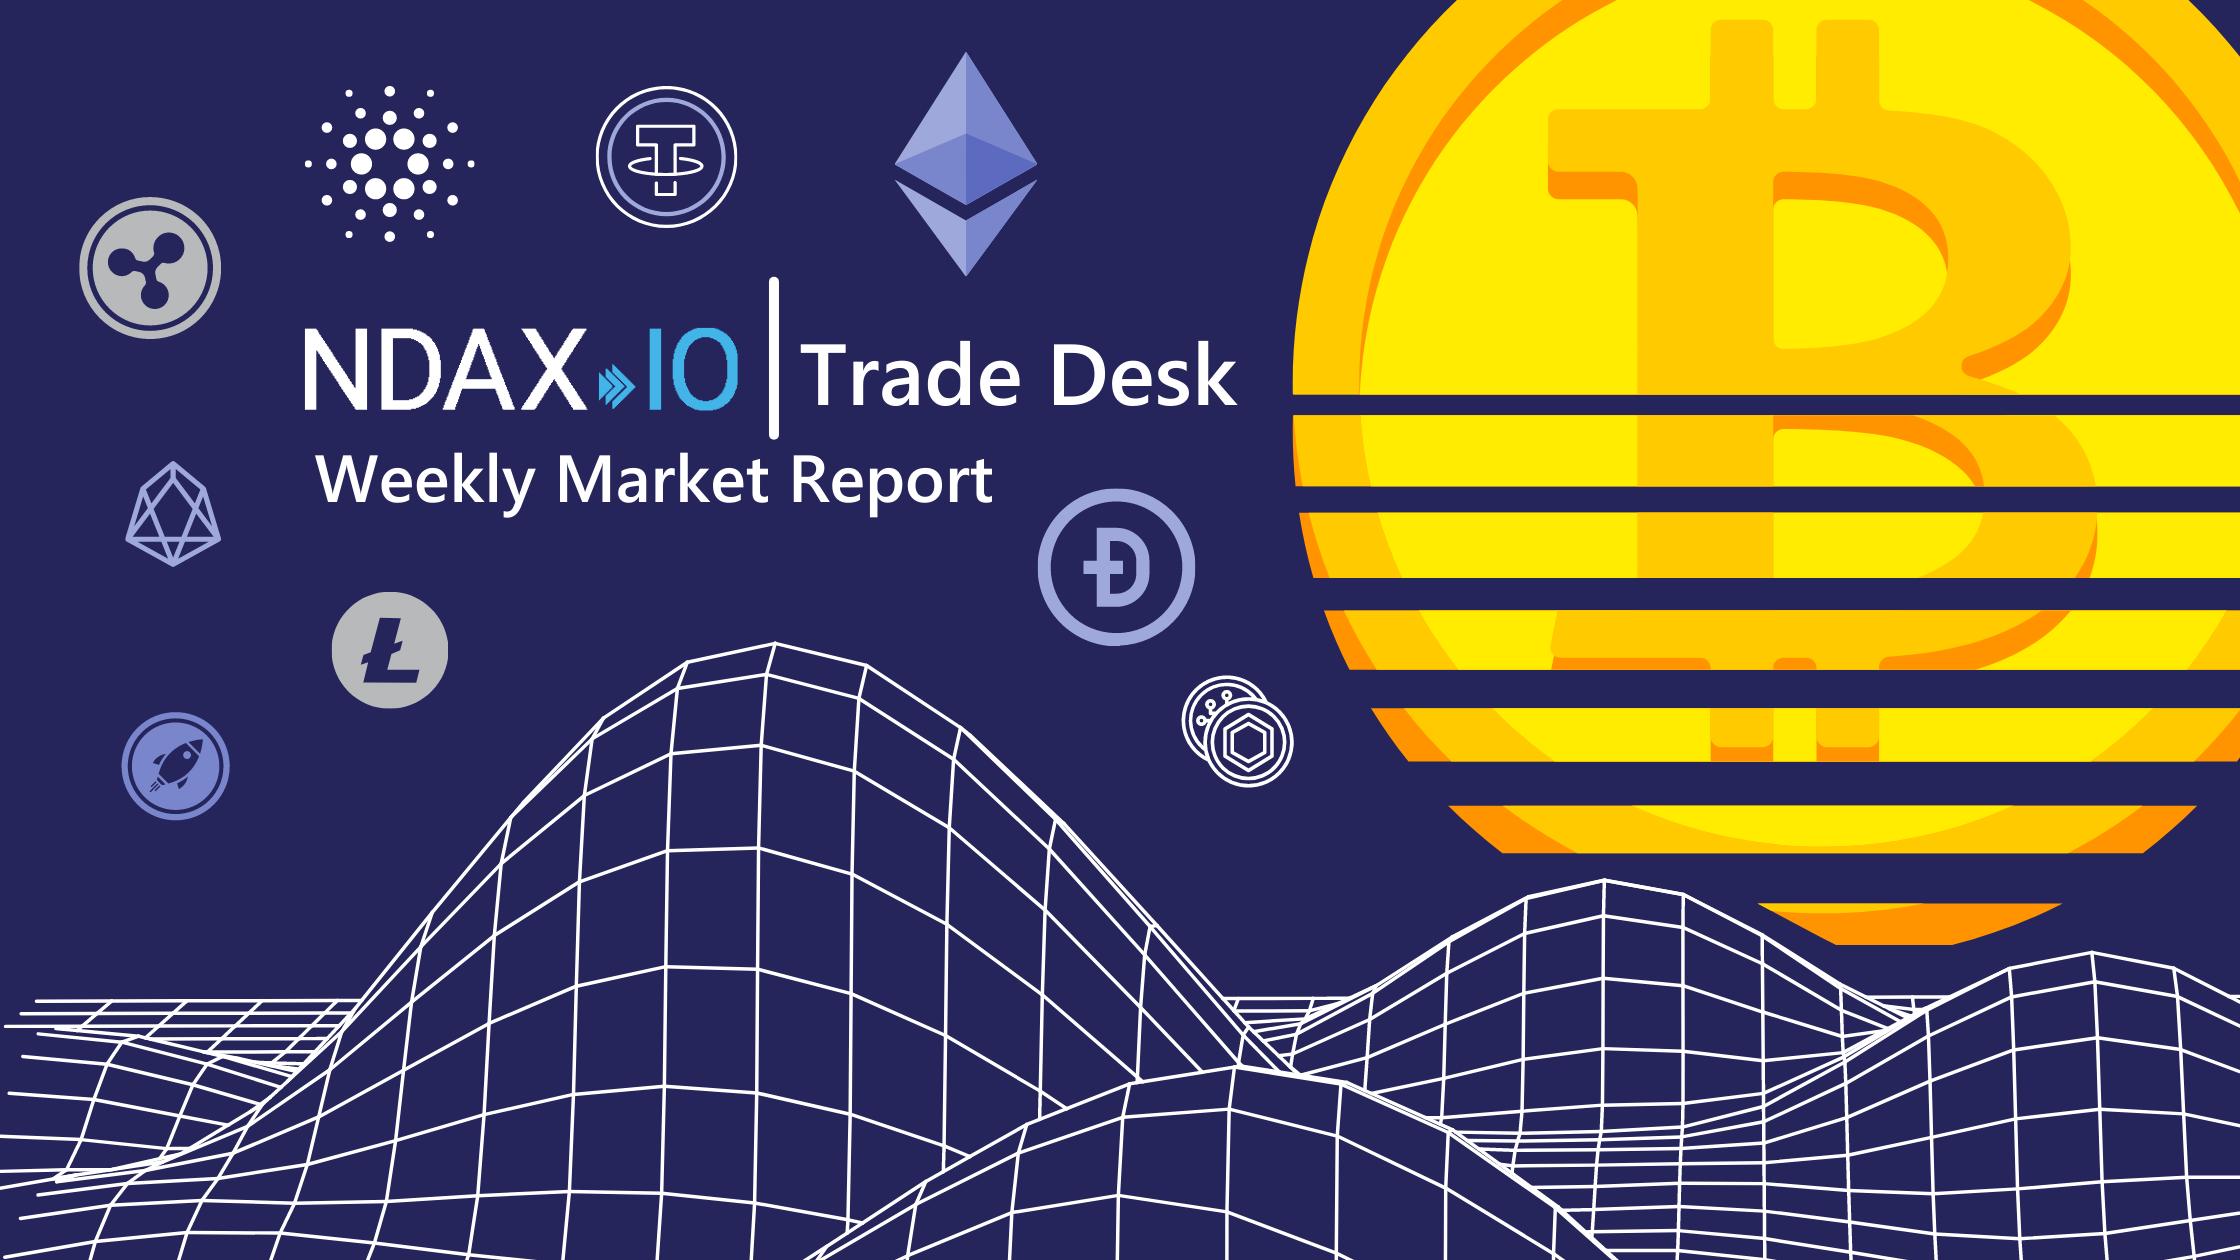 Weekly Market Report: September 13, 2021